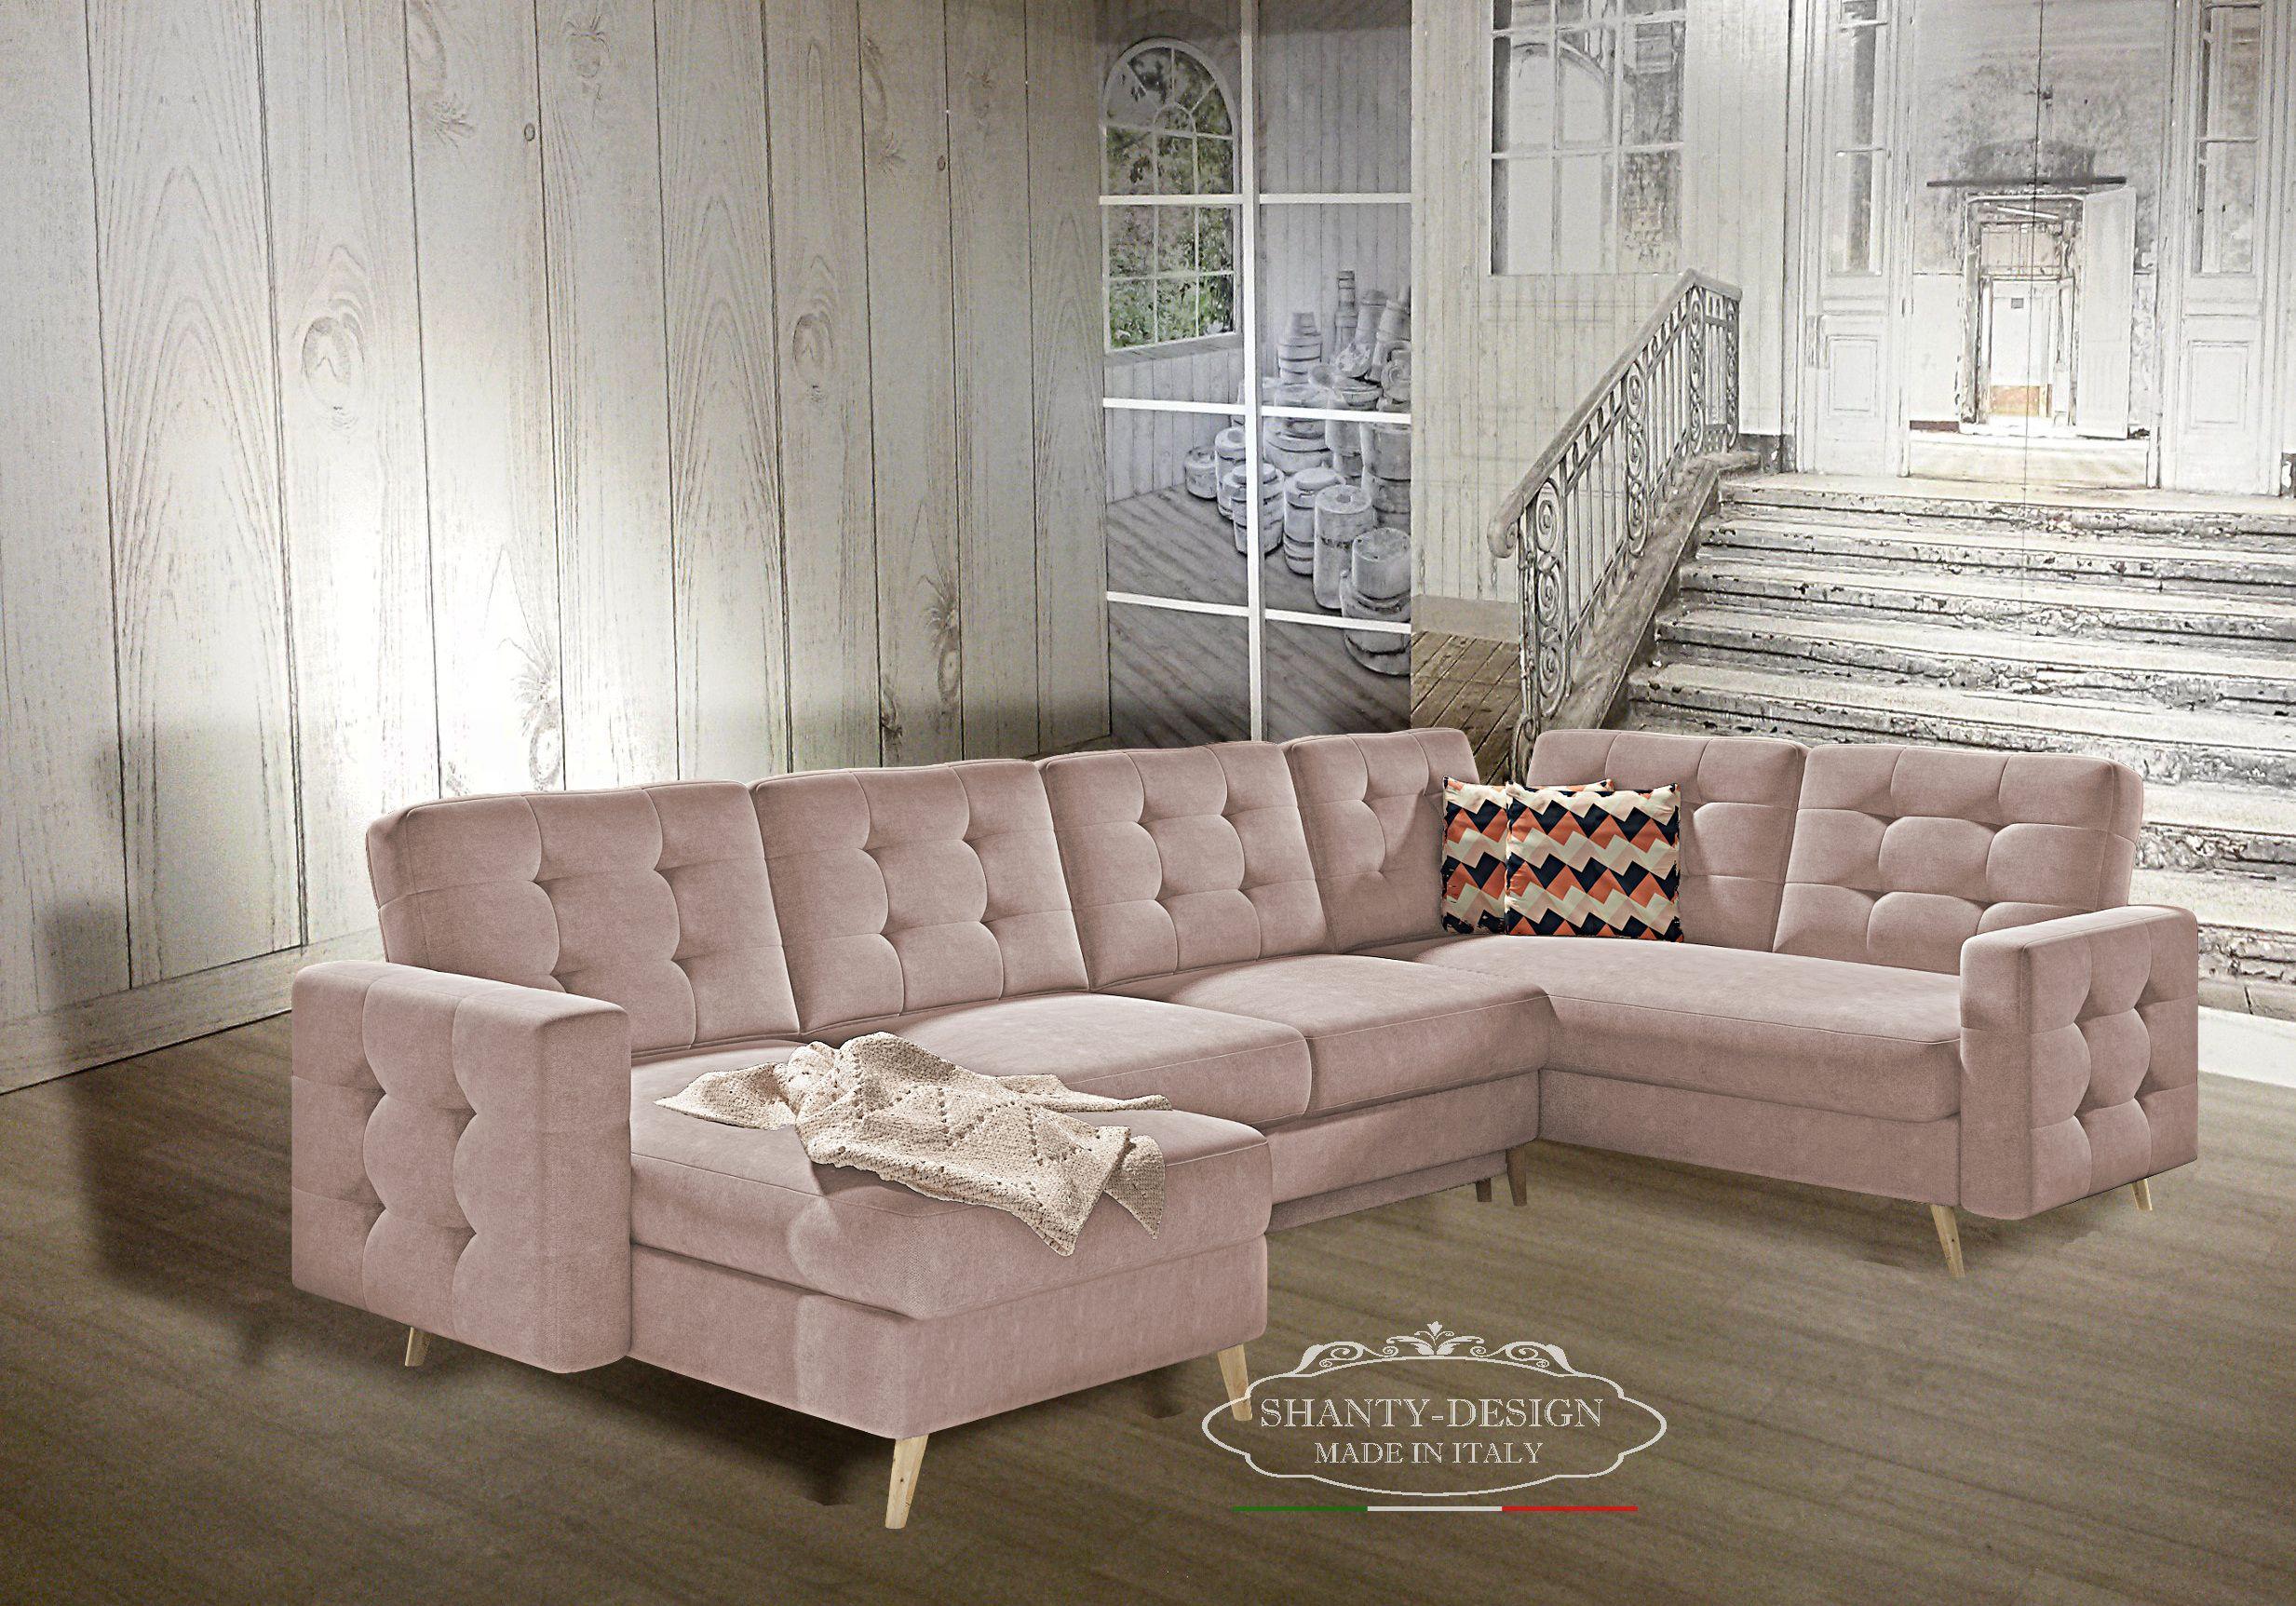 Divano Tessuto Antimacchia Opinioni divano 4 posti shabby scandi 2 con doppia penisola e chaise longue divani e  poltrone shabby chic